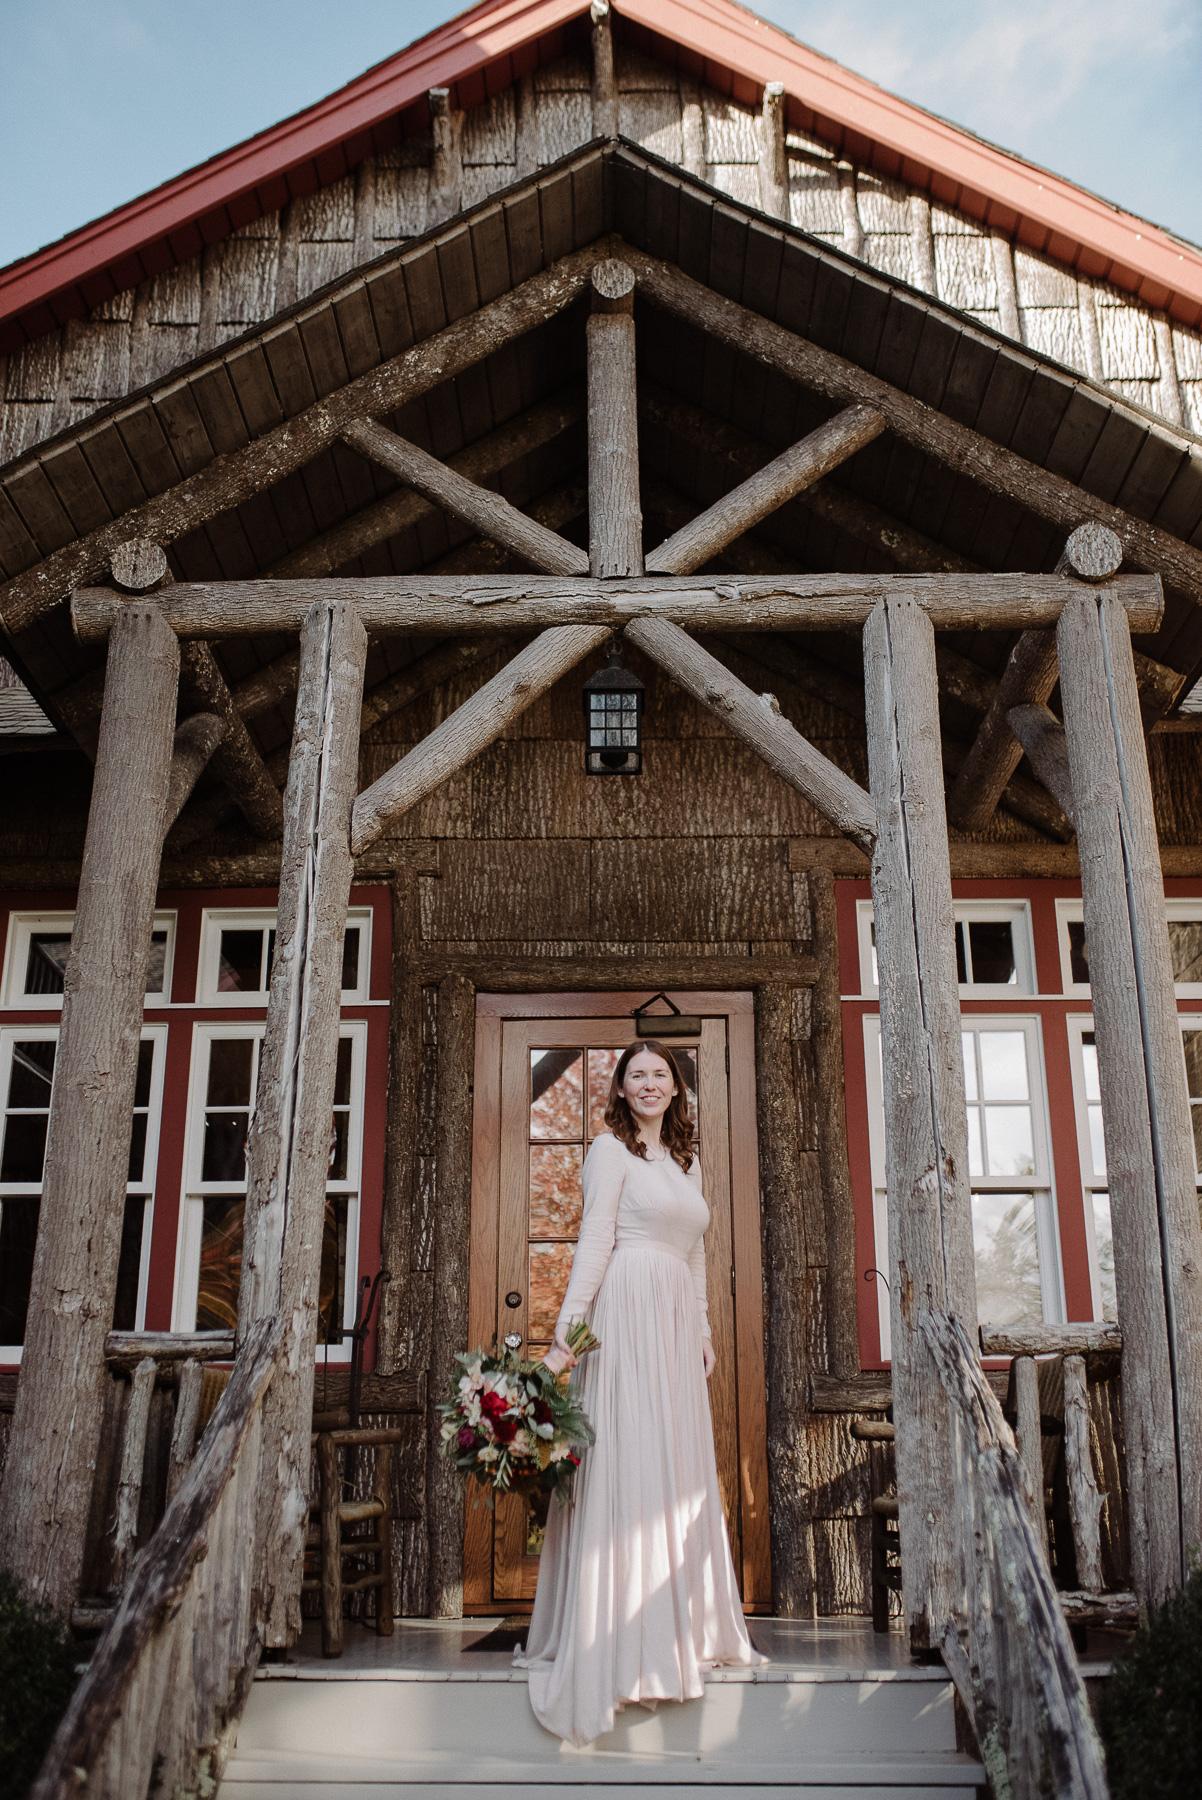 enowen-wedding-photography-linville-nc-carson-john-elopement (101 of 109).jpg